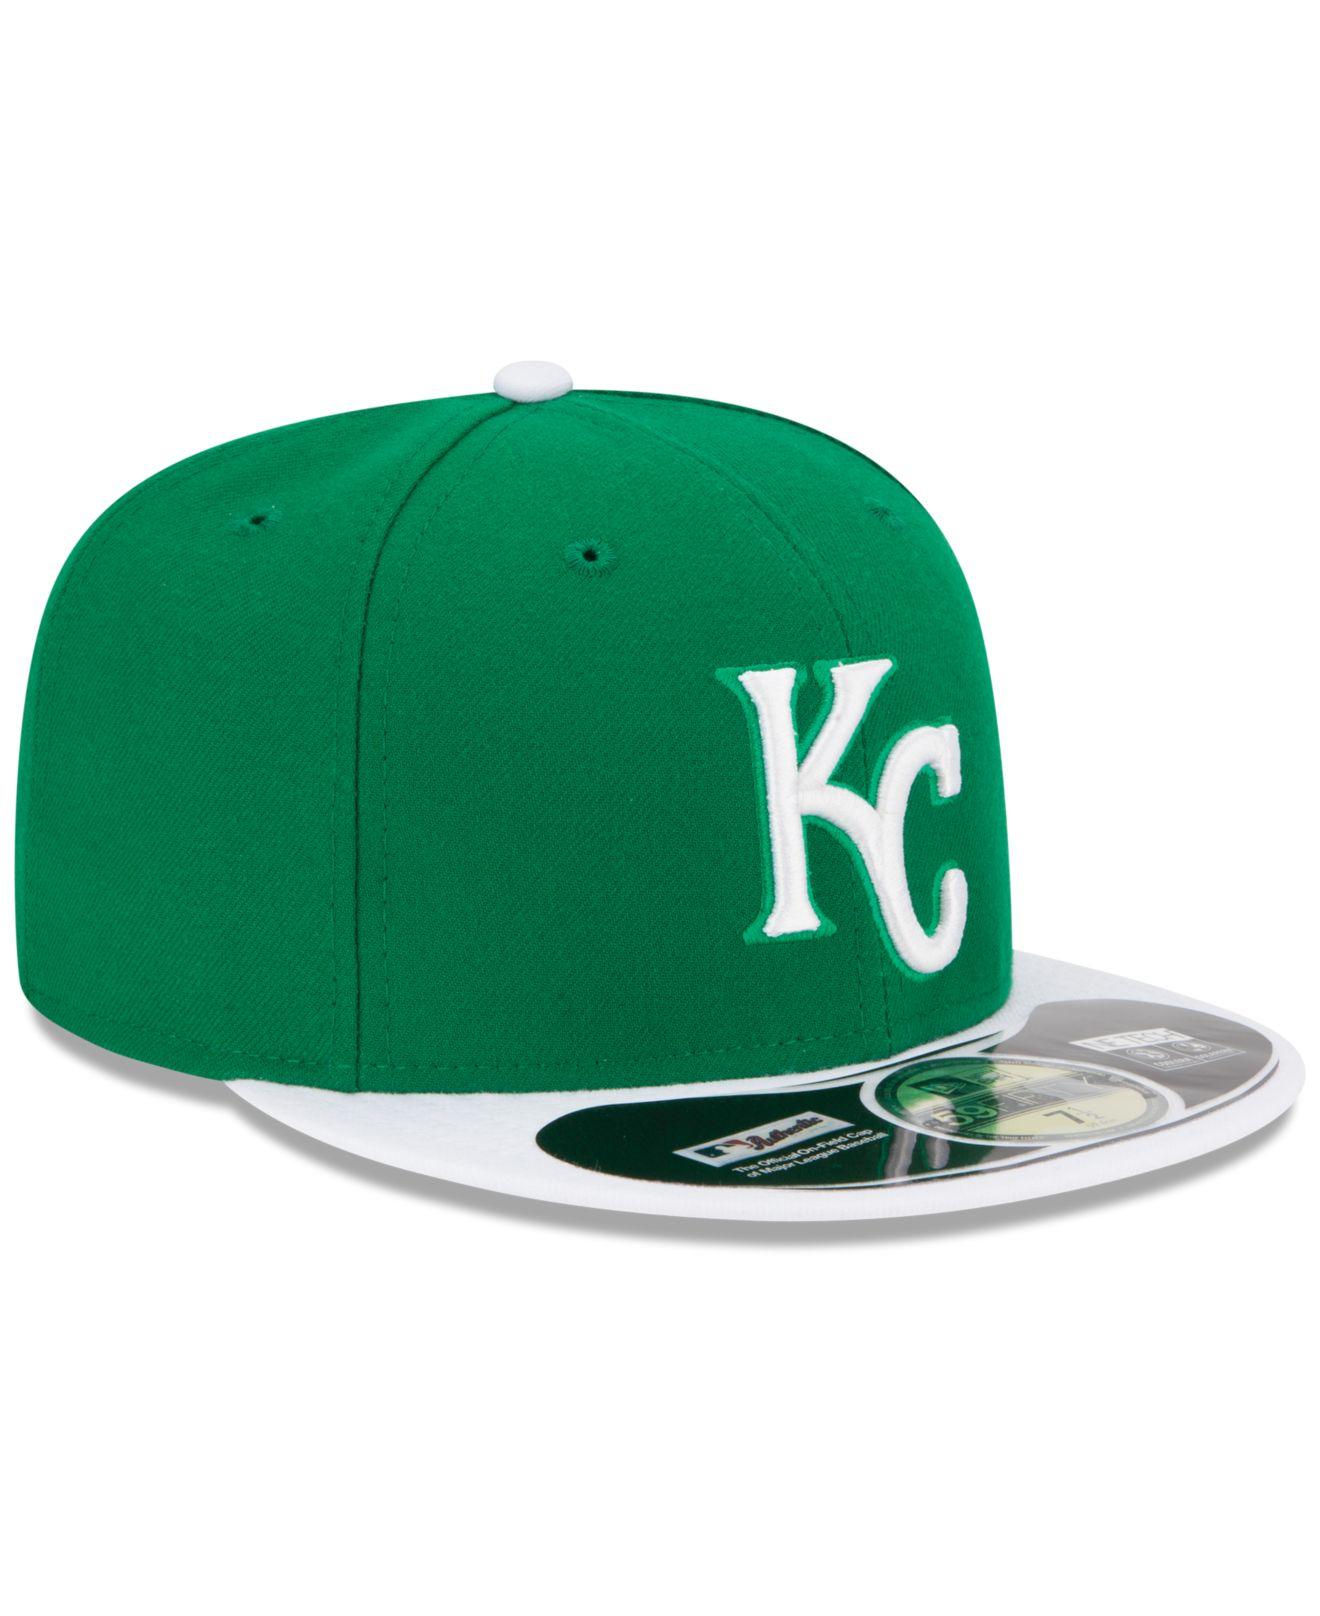 cd8f6fa2 netherlands green kansas city royals hat be7b5 fe589